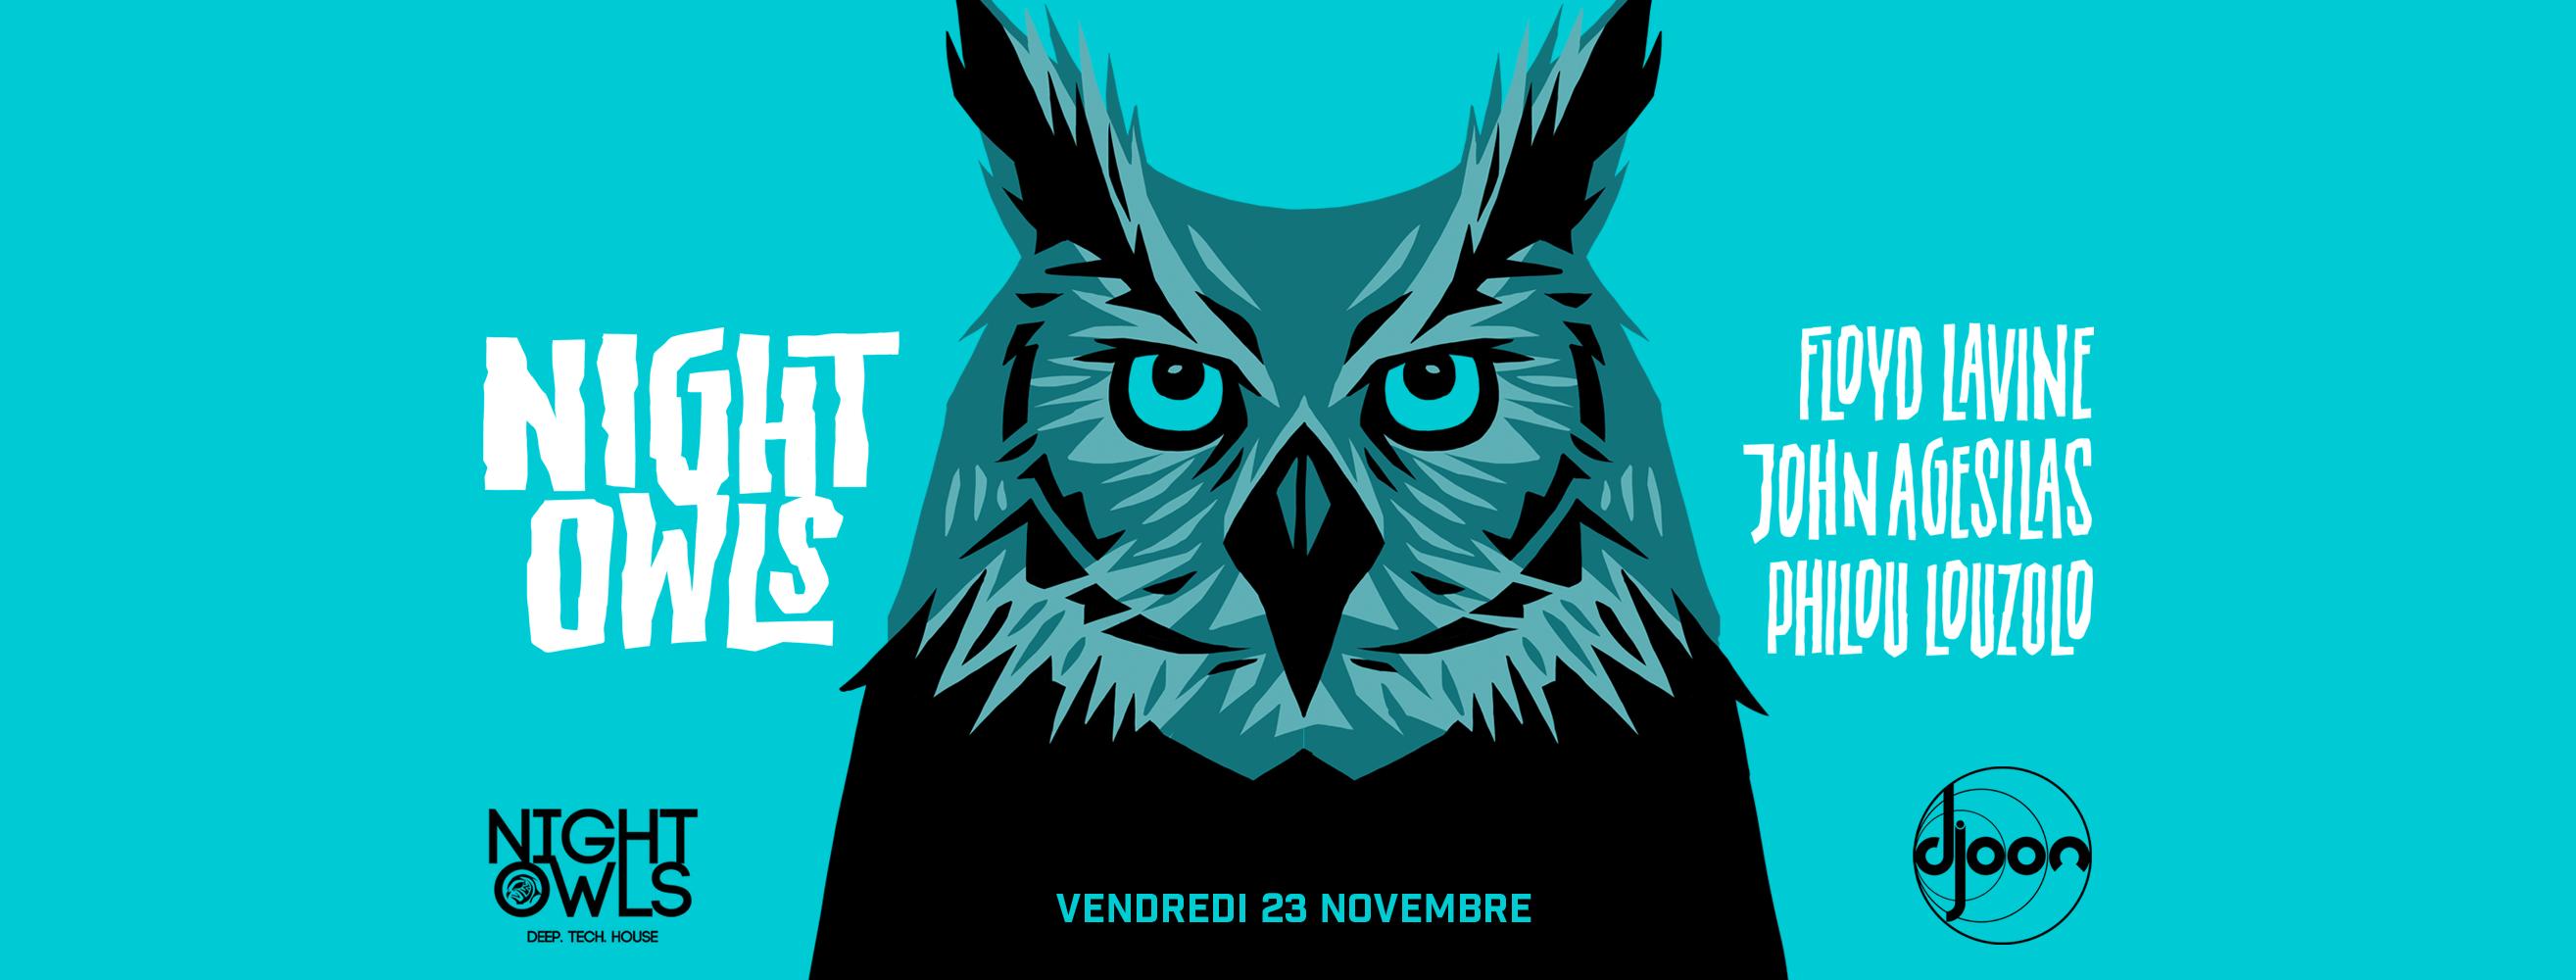 Night Owls: Floyd Lavine, John Agesilas, Philou Louzolo